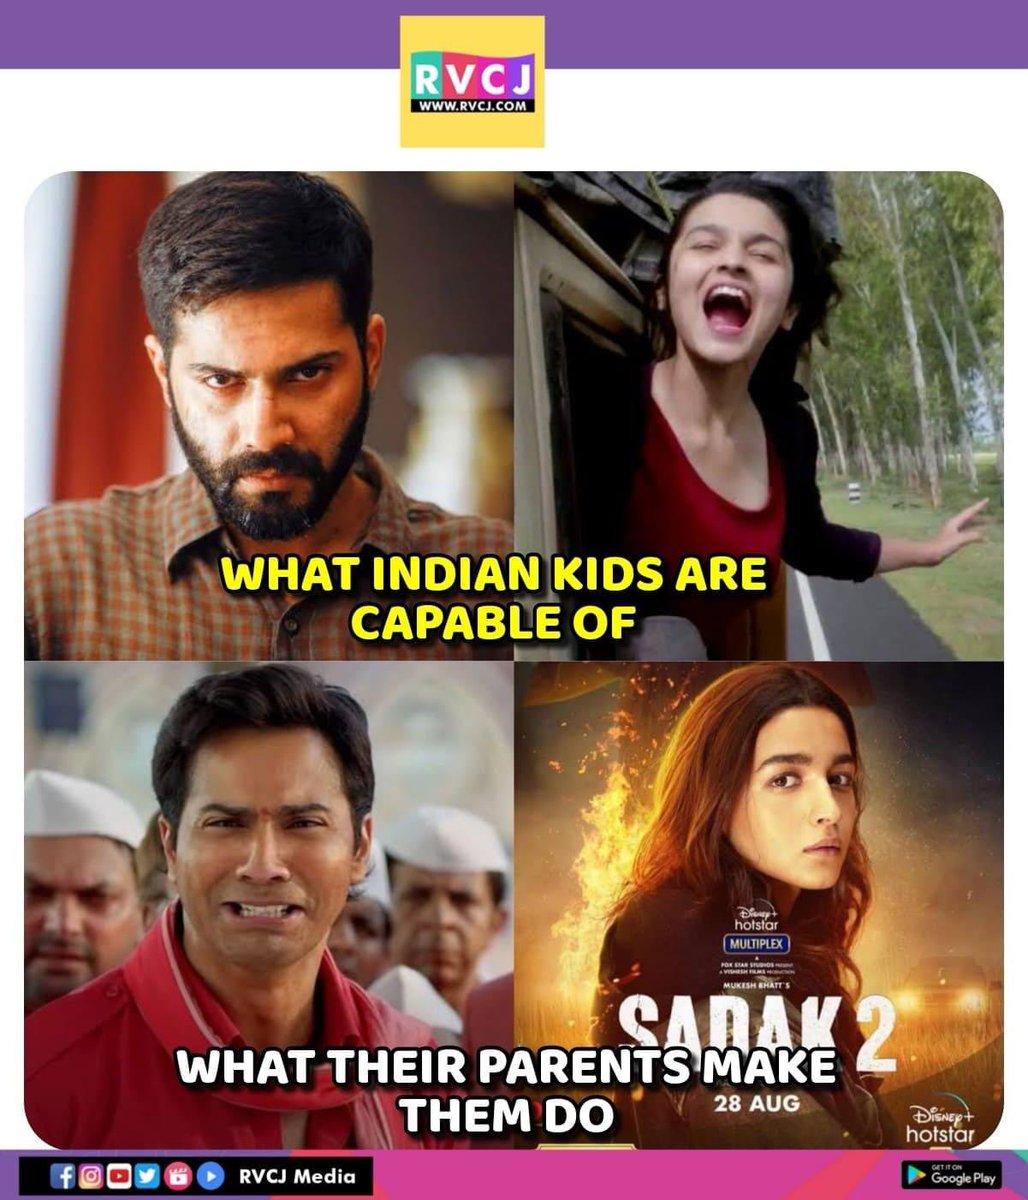 Sums up 😂 #varundhawan #aliabhatt #badlapur #highwaymovie #coolieno1 #sadak2 #bollywood #memes #maheshbhatt #daviddhawan #rvcjmovies